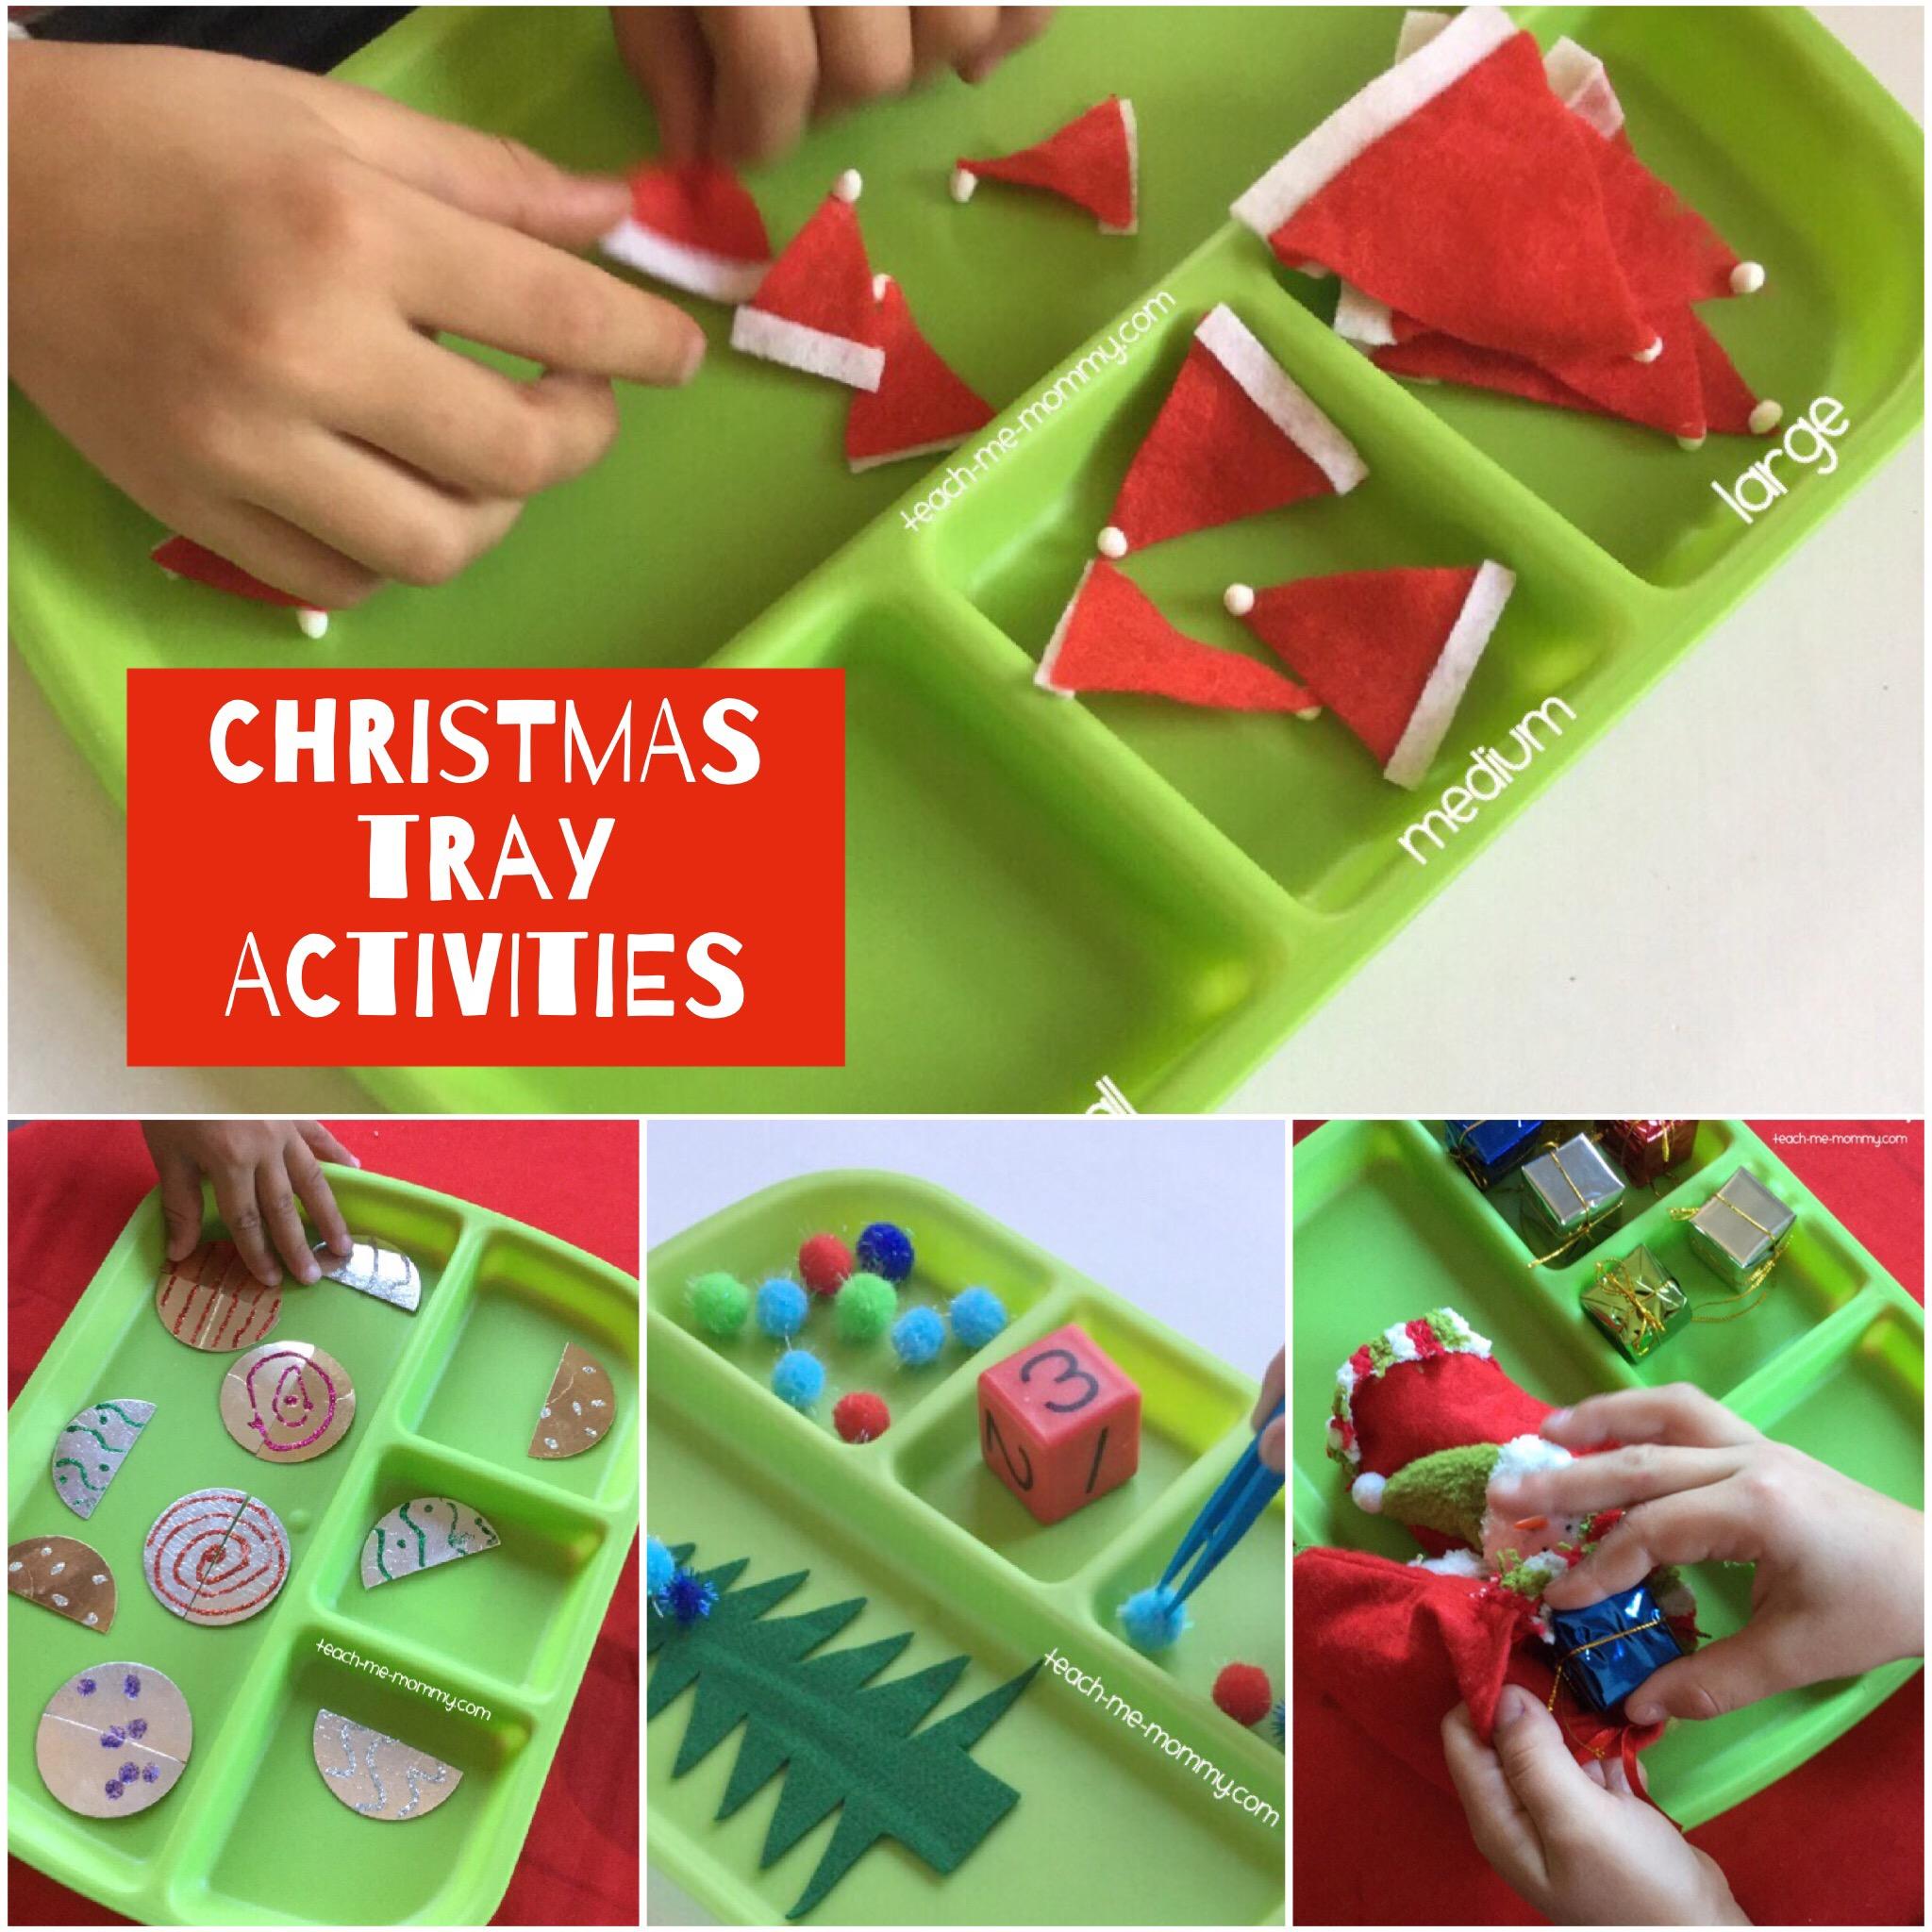 tray activities